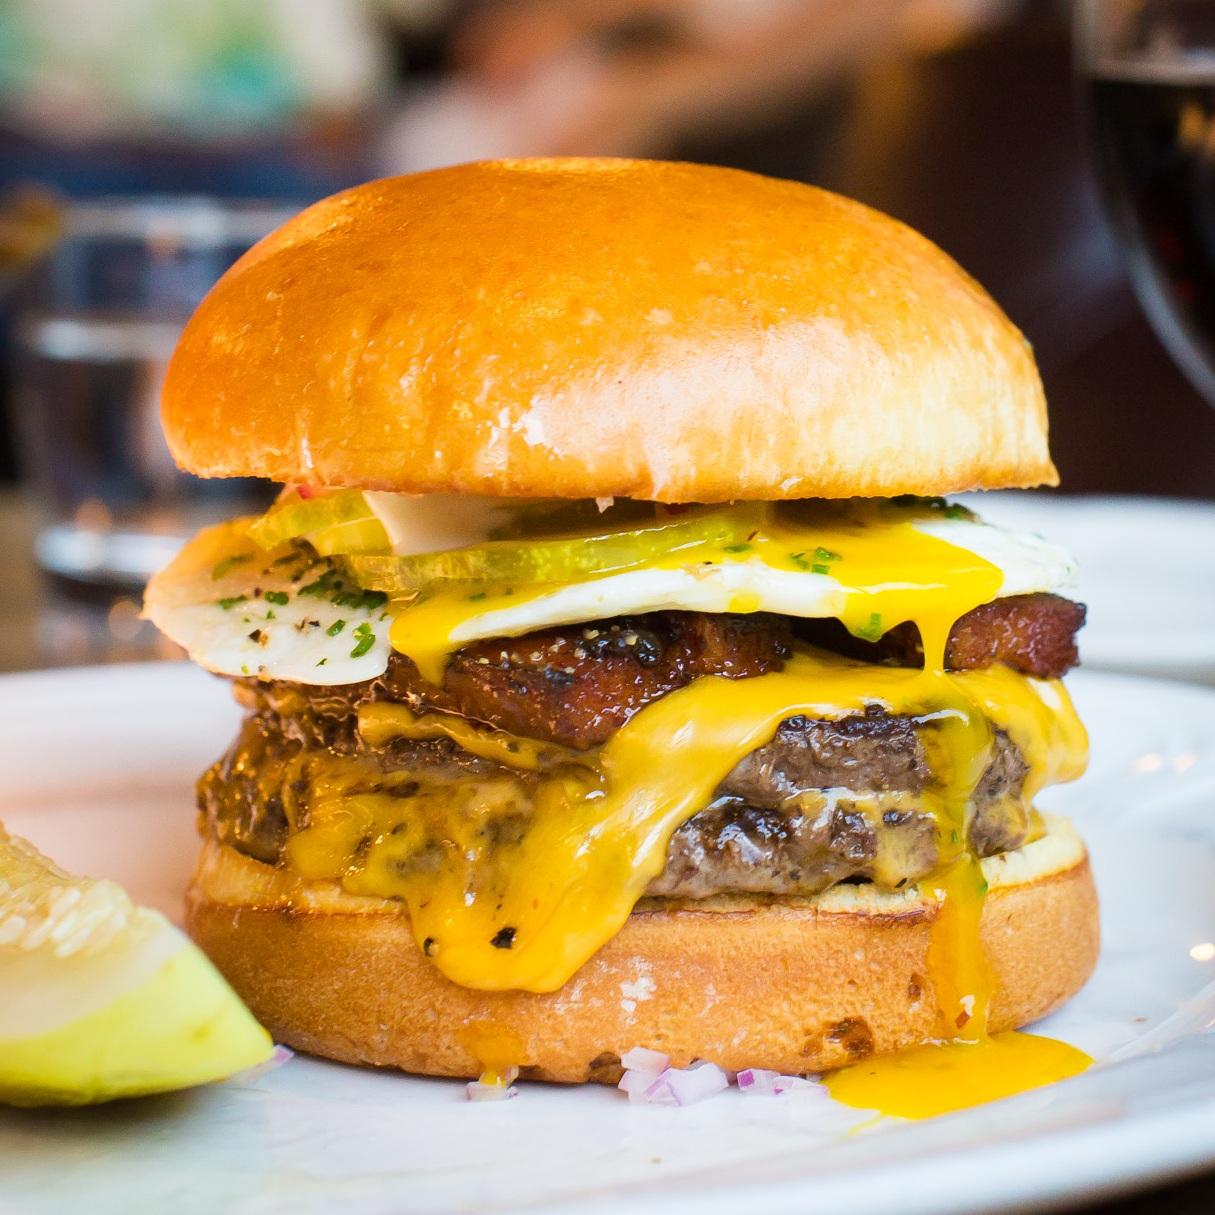 Au Cheval - $$, West Loop, Burgers, Brunch, Gluten-free